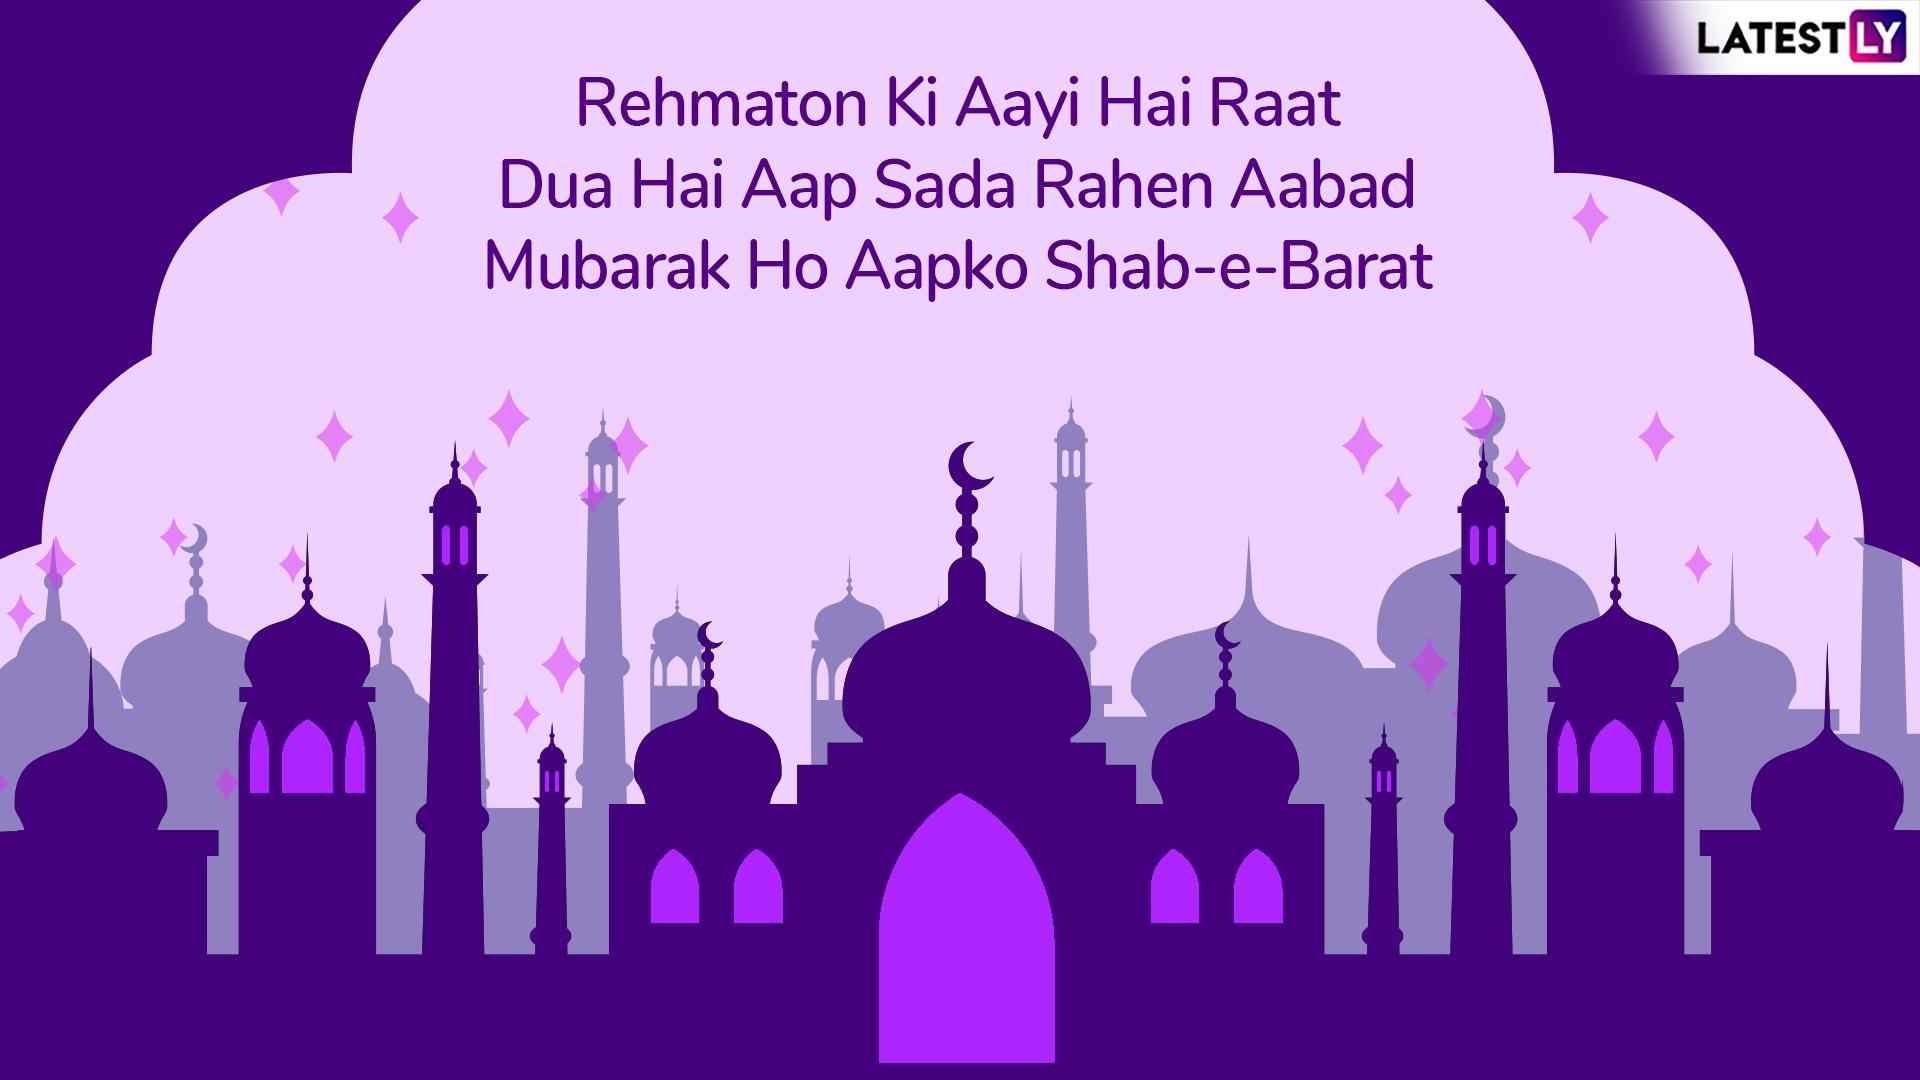 Shab e barat mubarak messages whatsapp stickers gif image greetings sms wishes